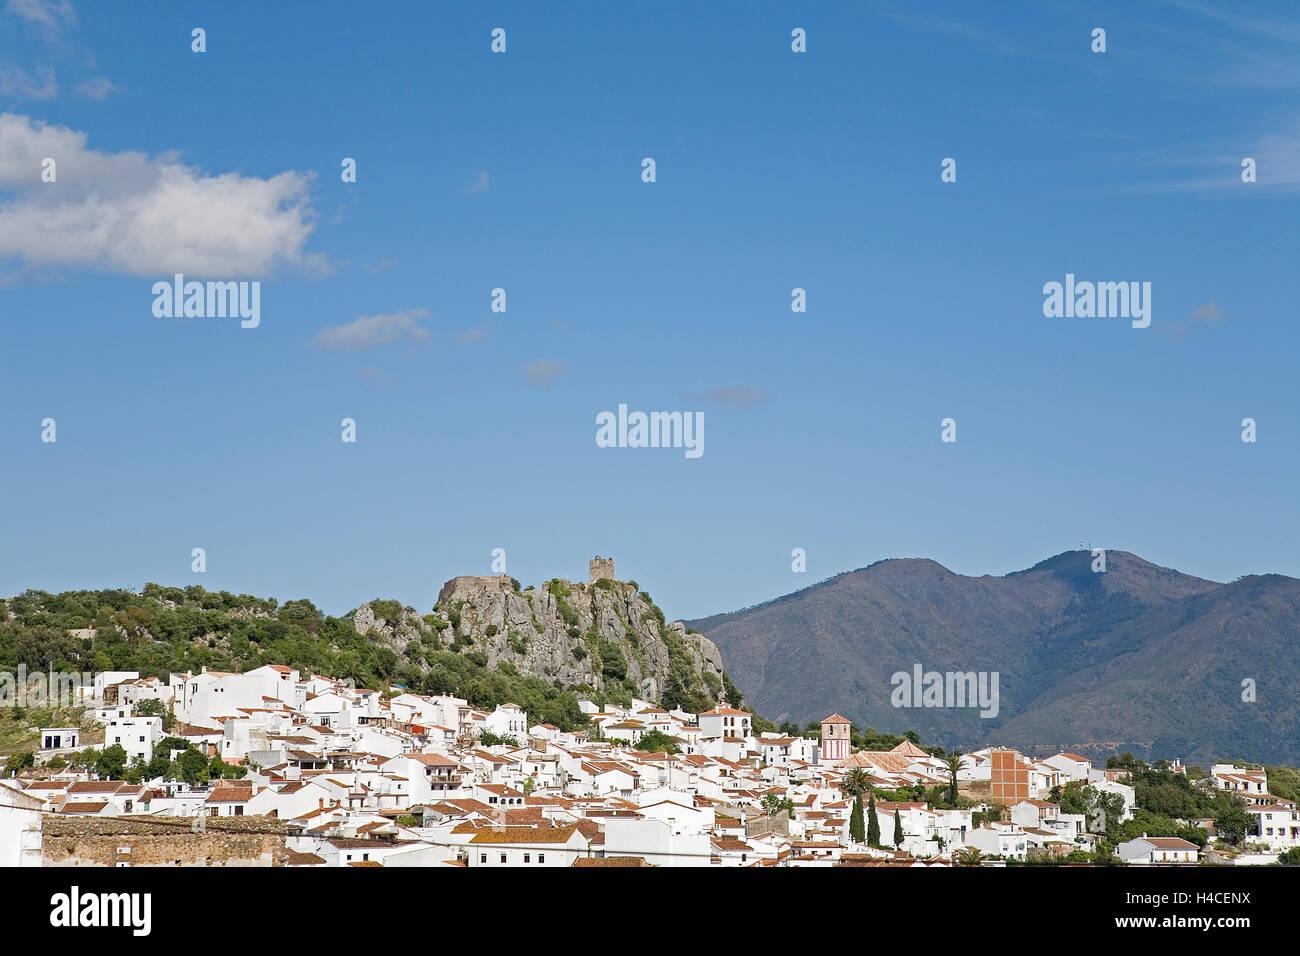 Gaucín, Serranía de Ronda, Málaga Province, Andalusia, Spain - Stock Image